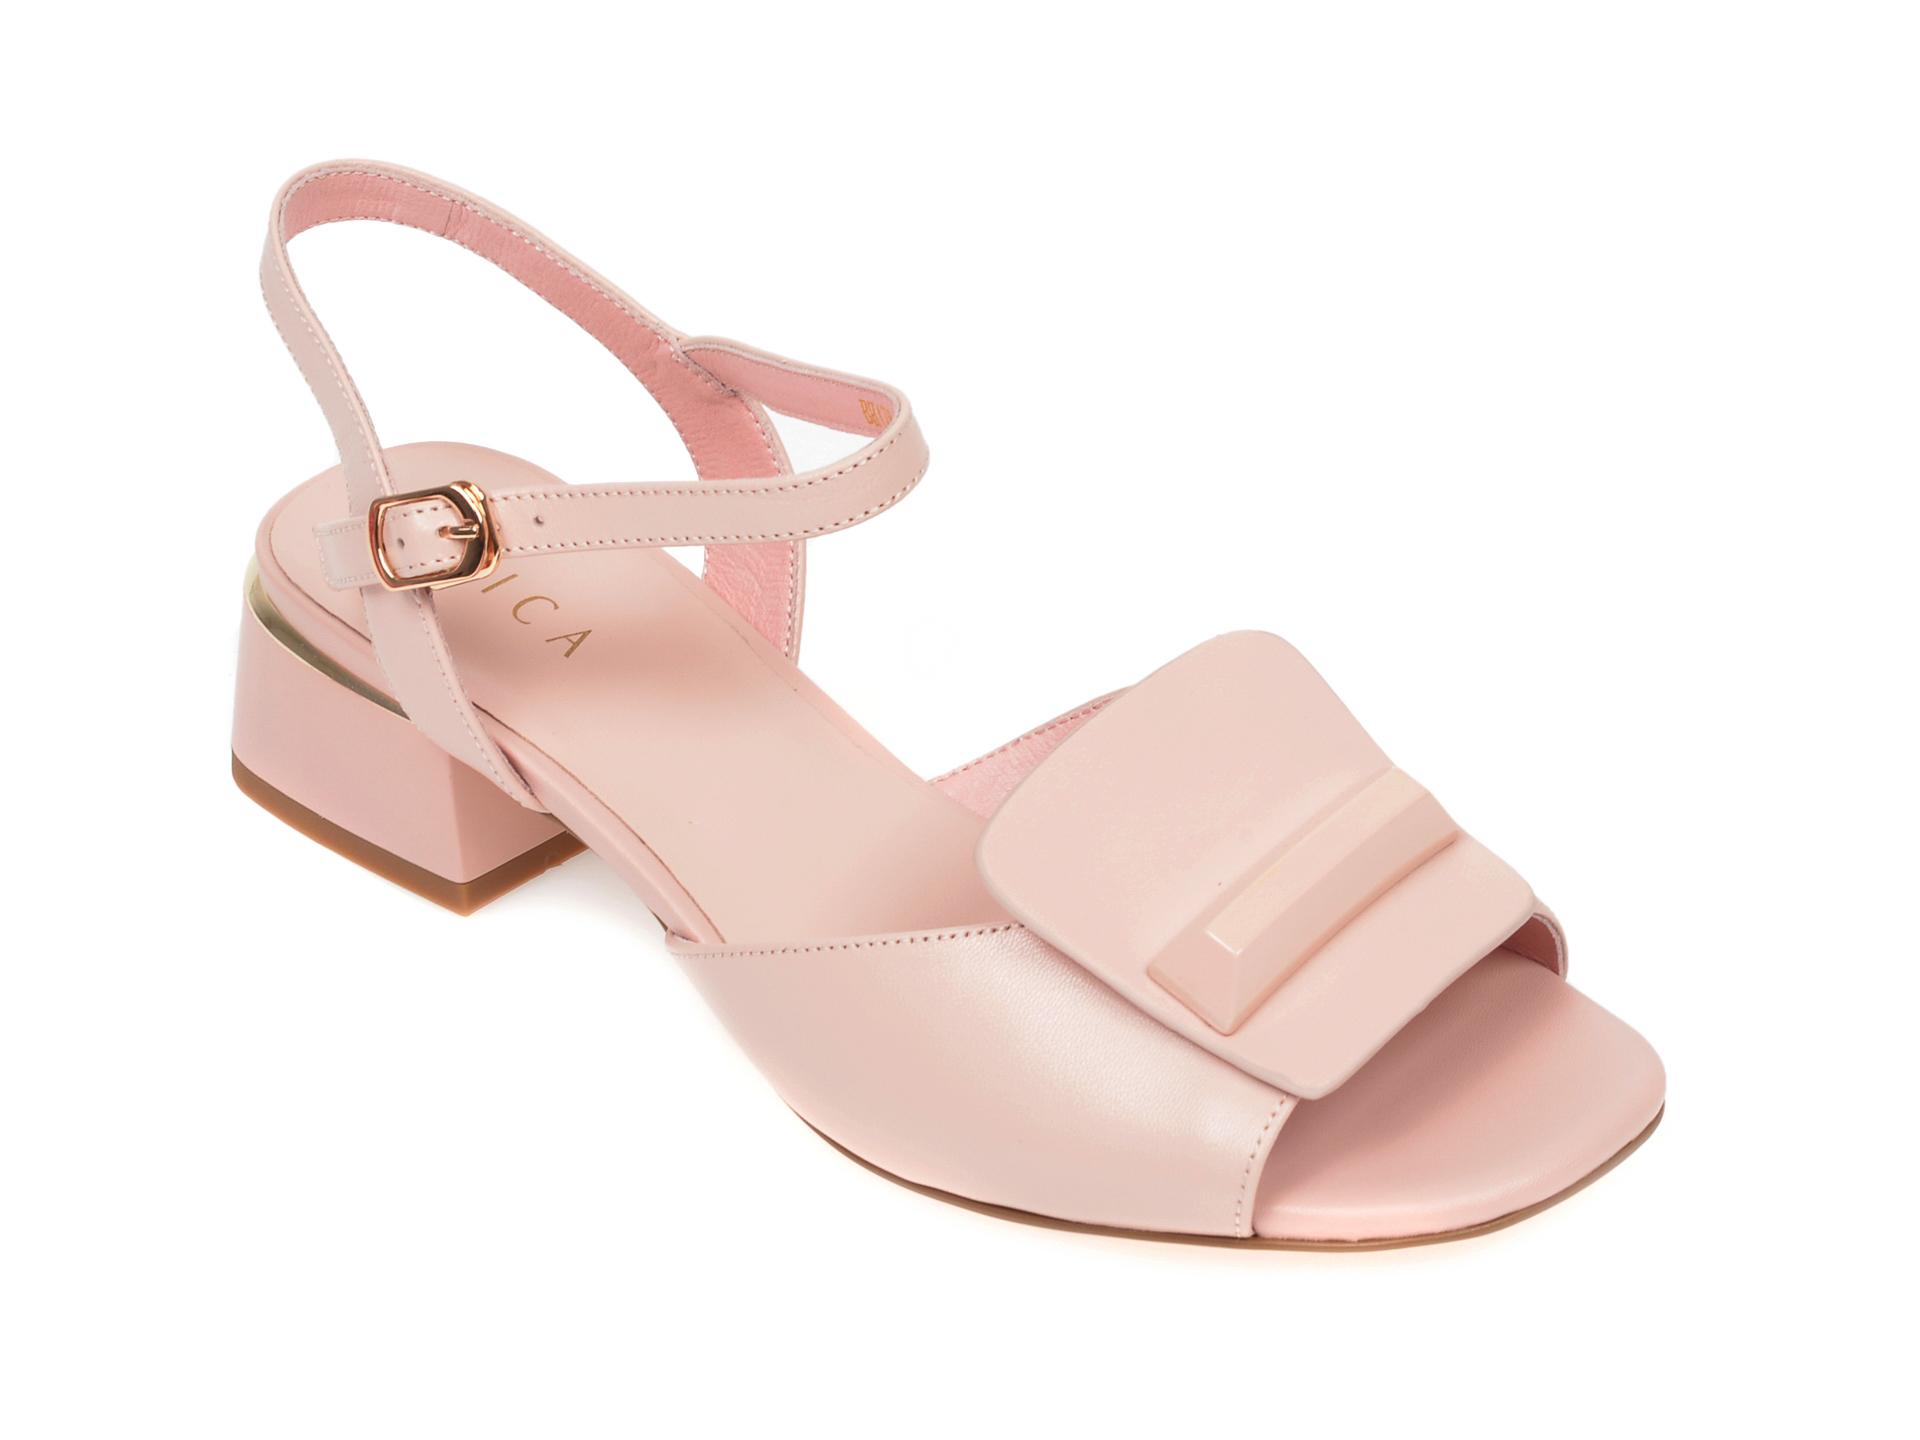 Sandale EPICA roz, BH179, din piele naturala New